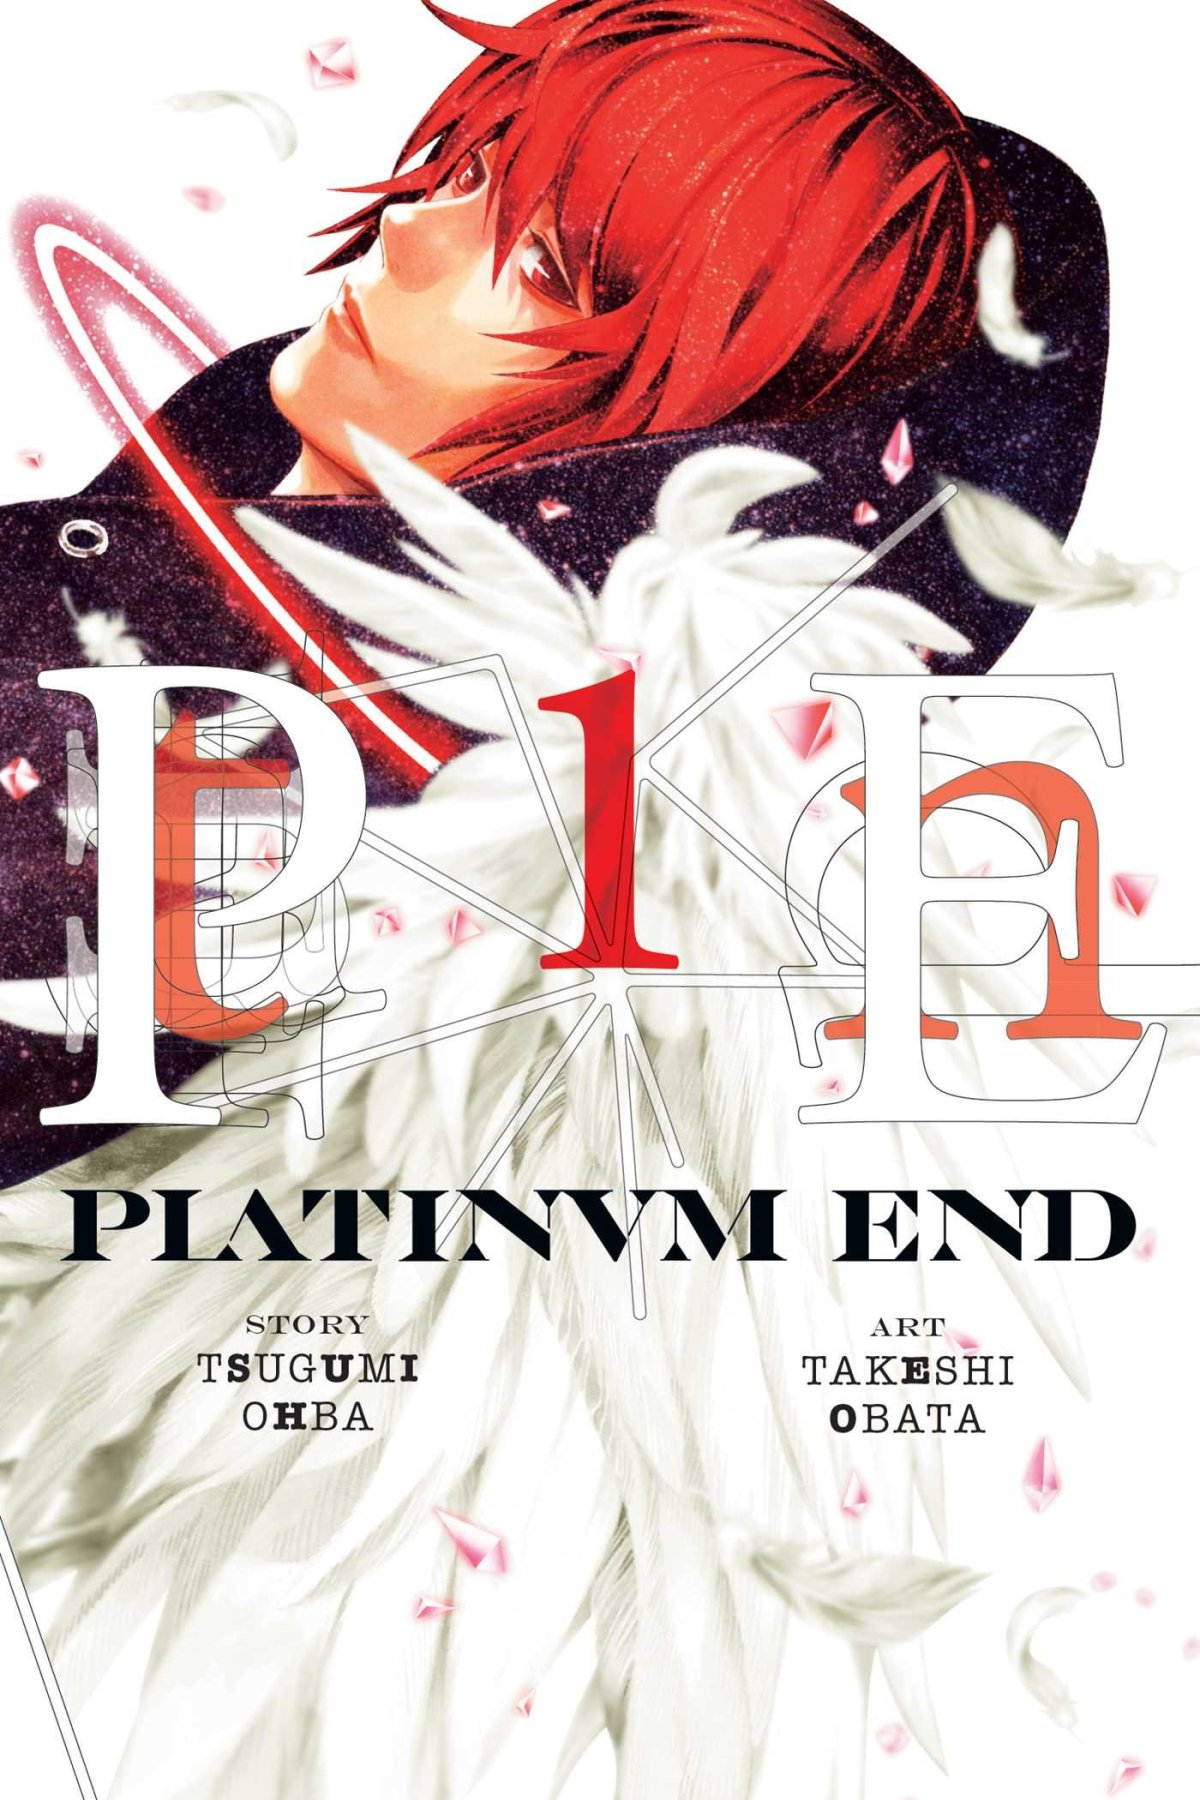 Intip Trailer Platinum End, Anime Adaptasi Manga Kreator Death Note 2